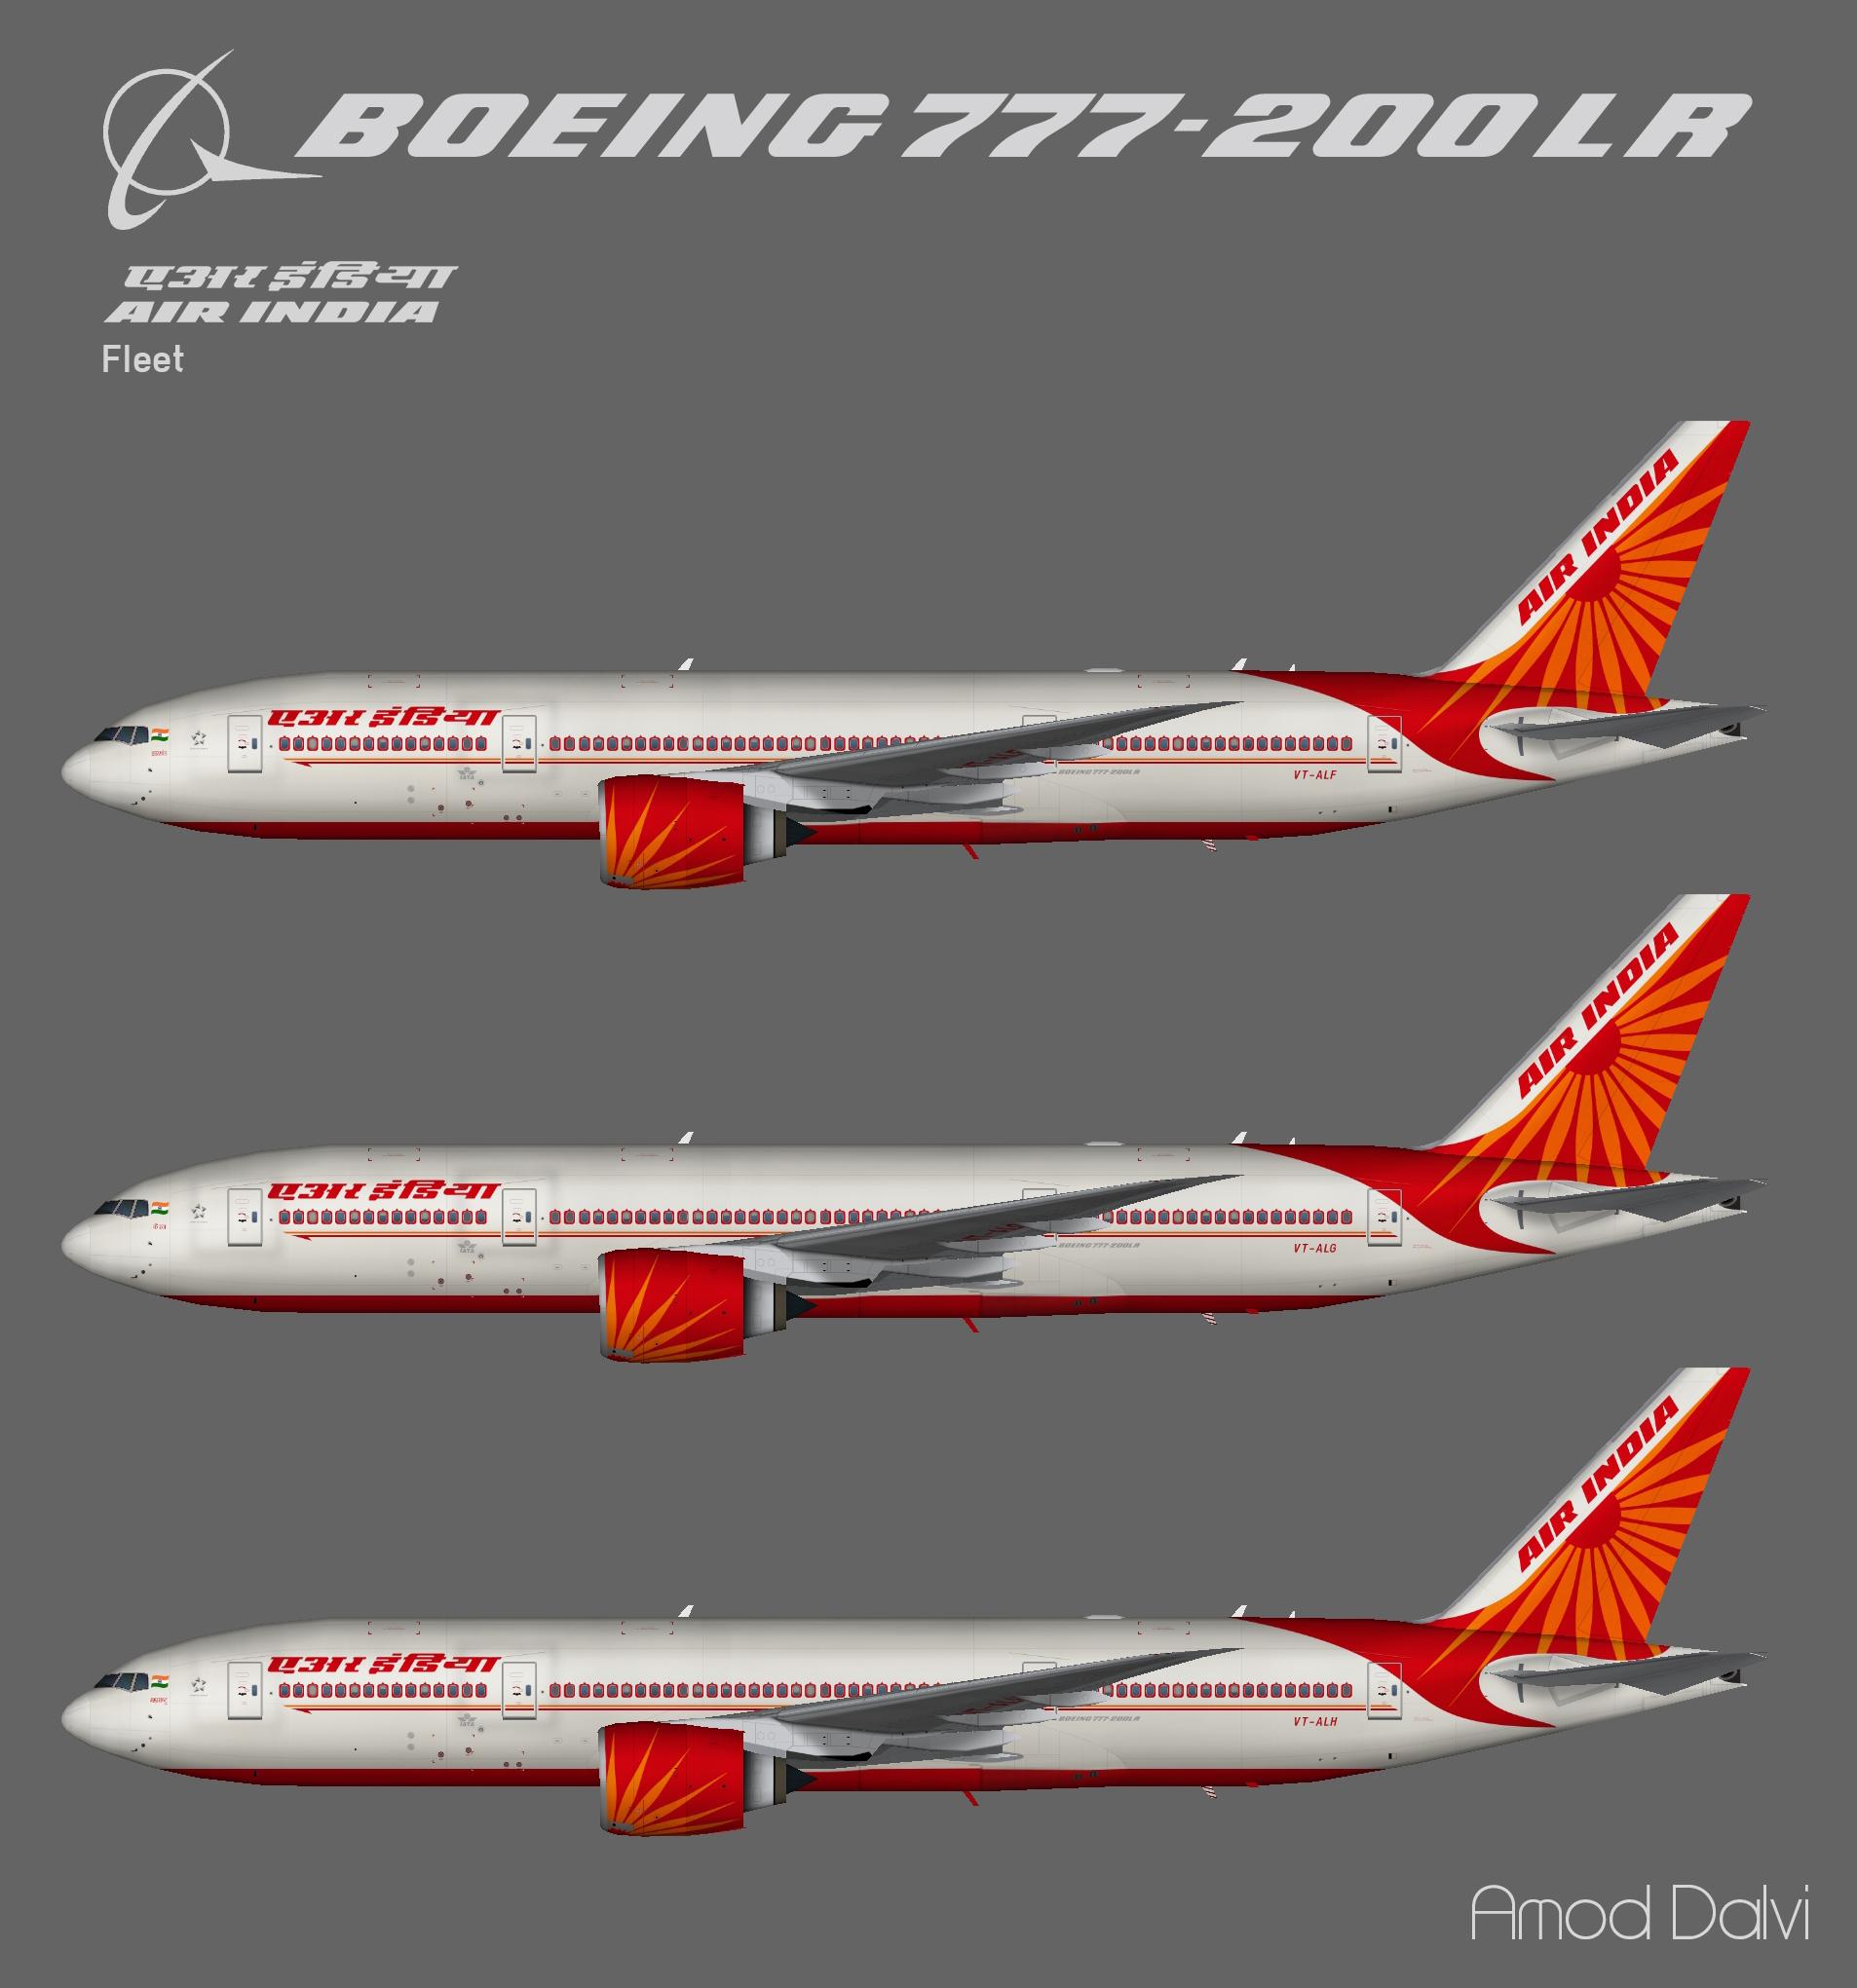 Air India Boeing 777-200LR – Amod